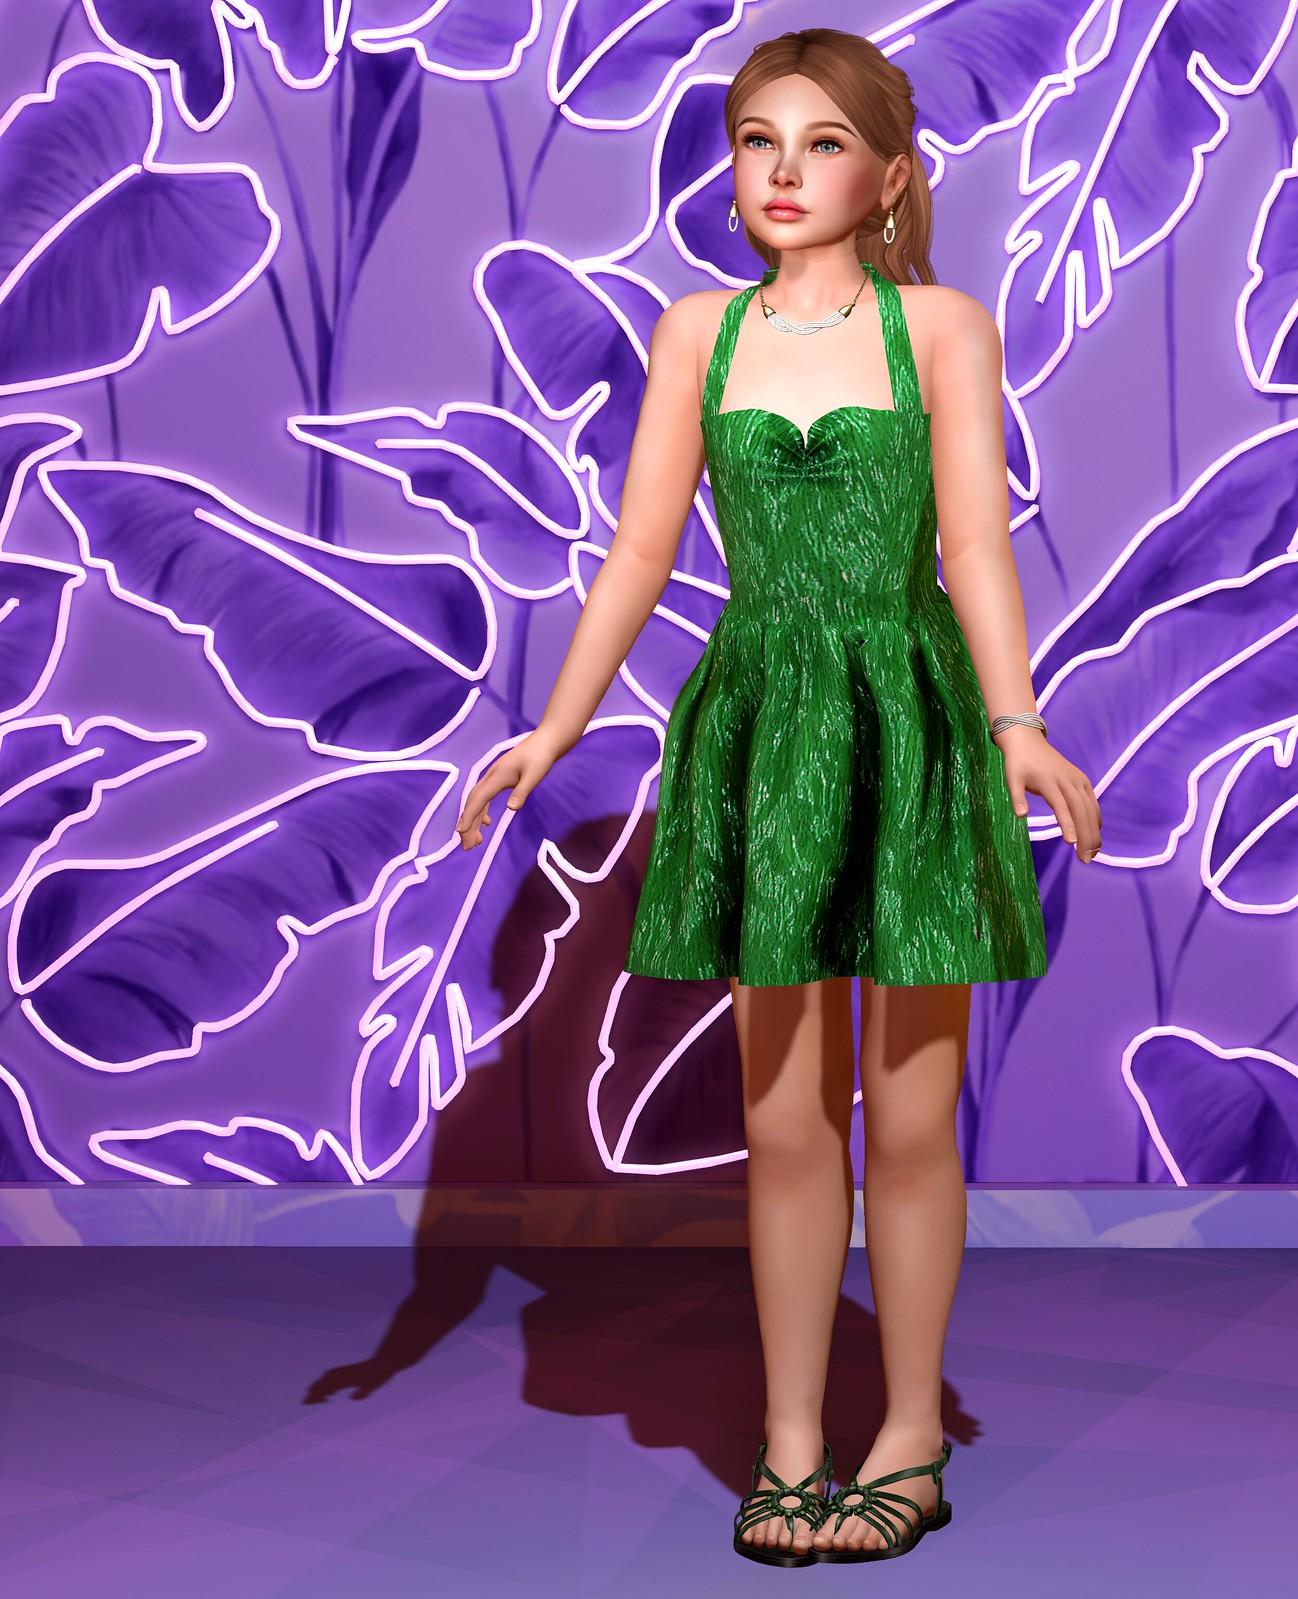 Tween Partaytay Dress